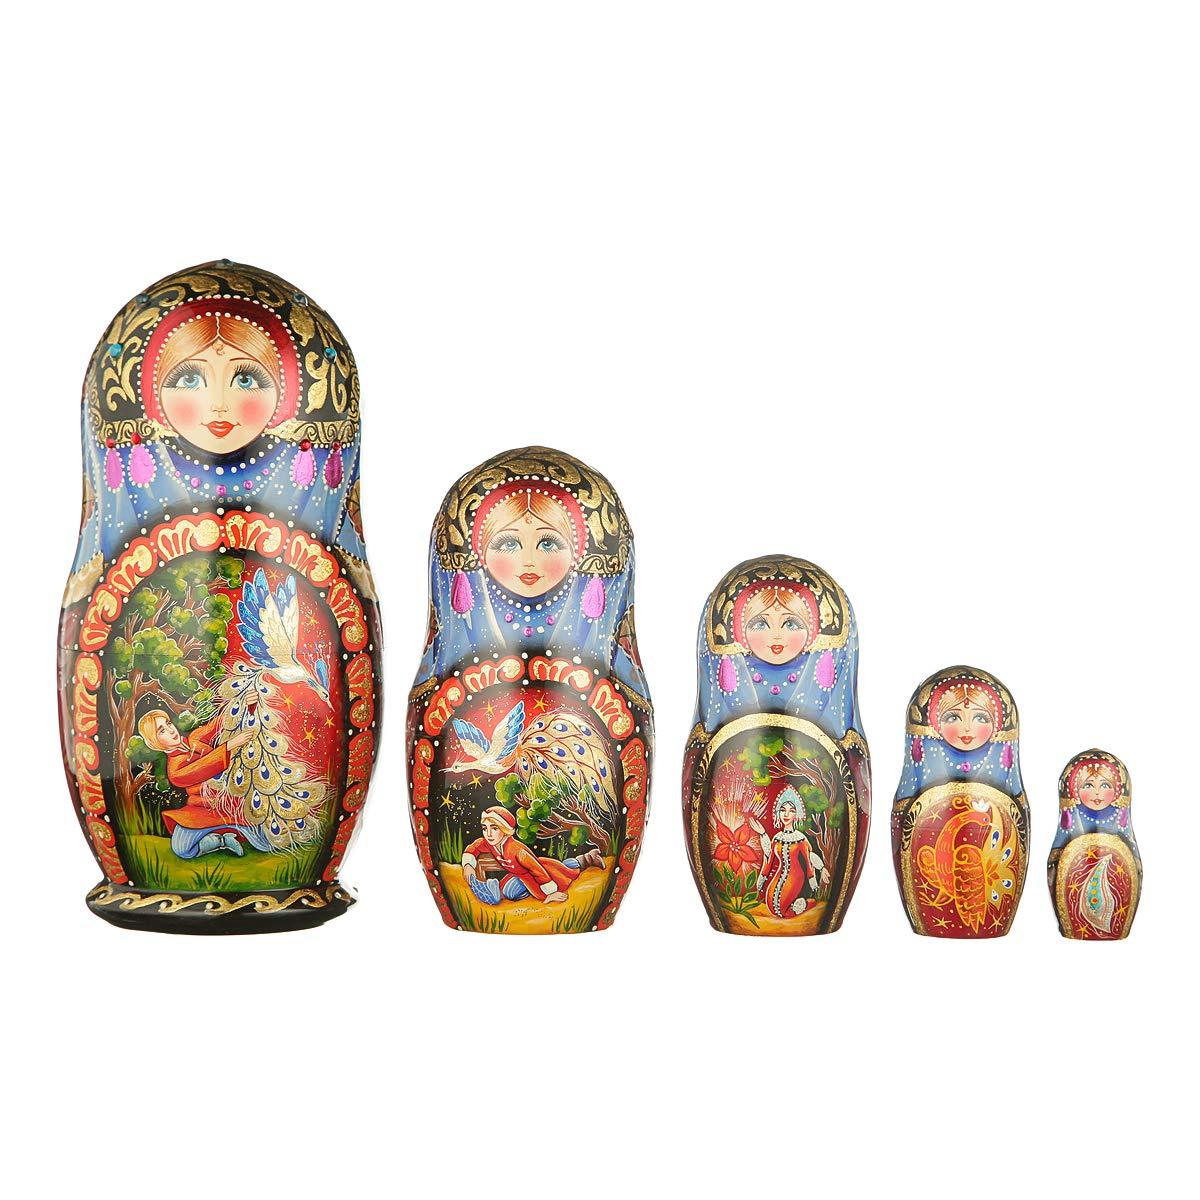 danila-souvenirs Russian Wooden Nesting Dolls Hand Painted Matryoshka 5 pcs Set Fairy Tale 7.5''